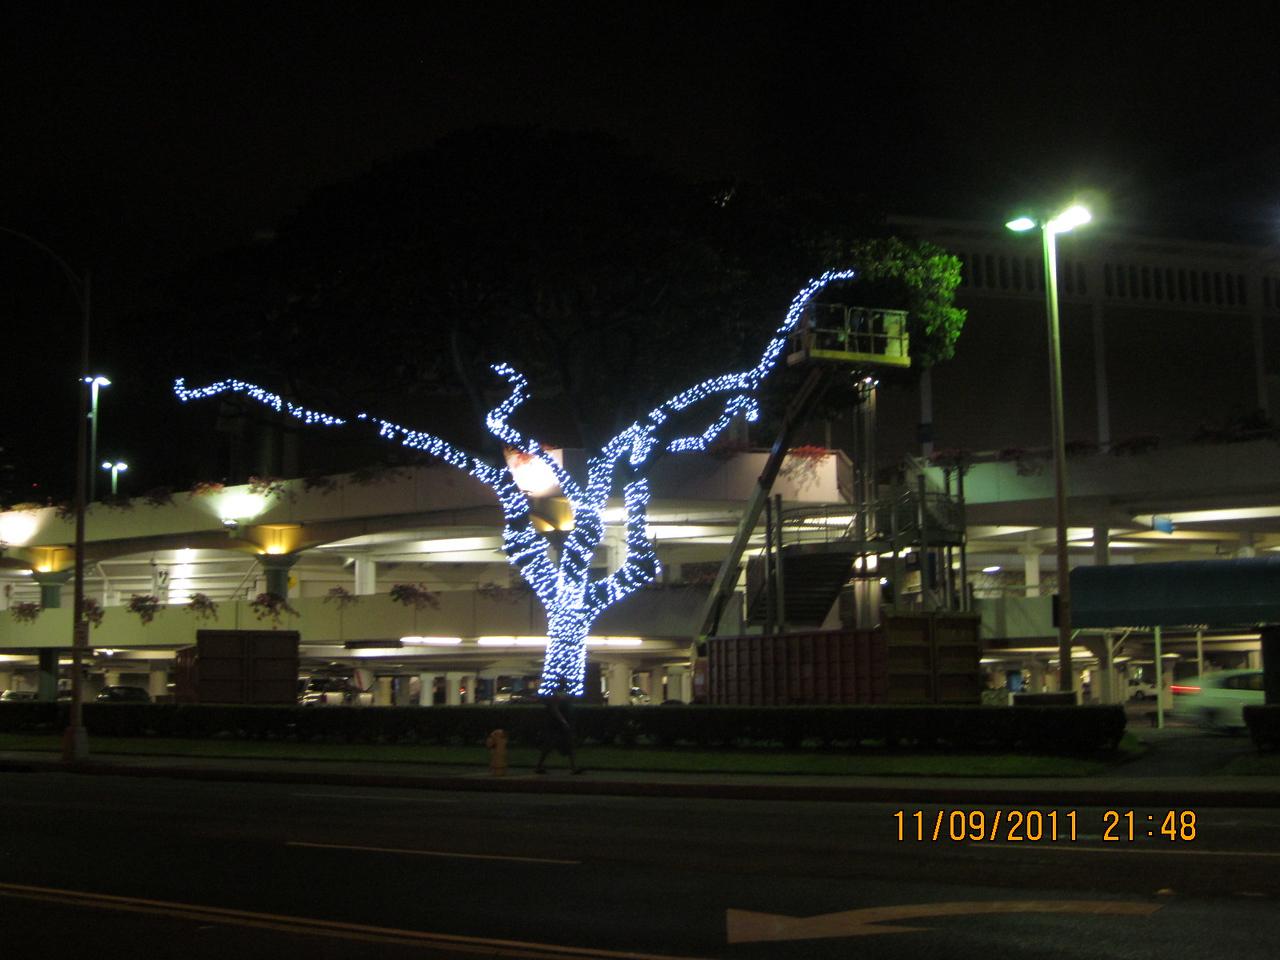 Ala Moana Mall.. starting to decorate for holiday season